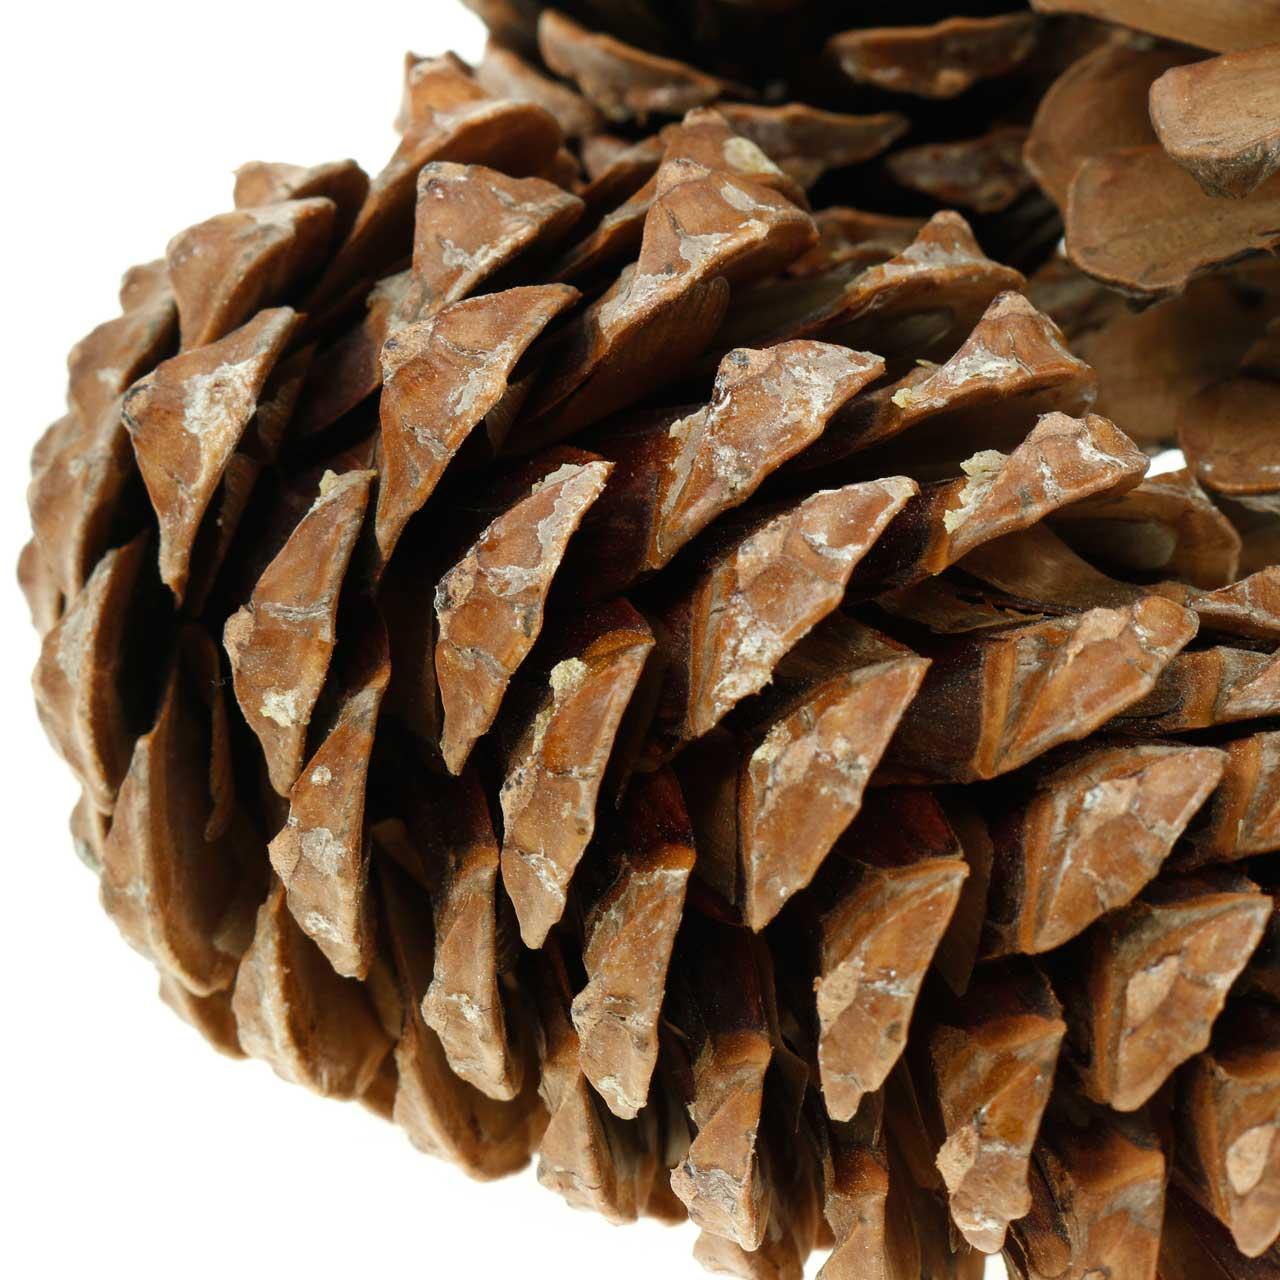 Pinus Pinea groß 14/18cm Natur 50St